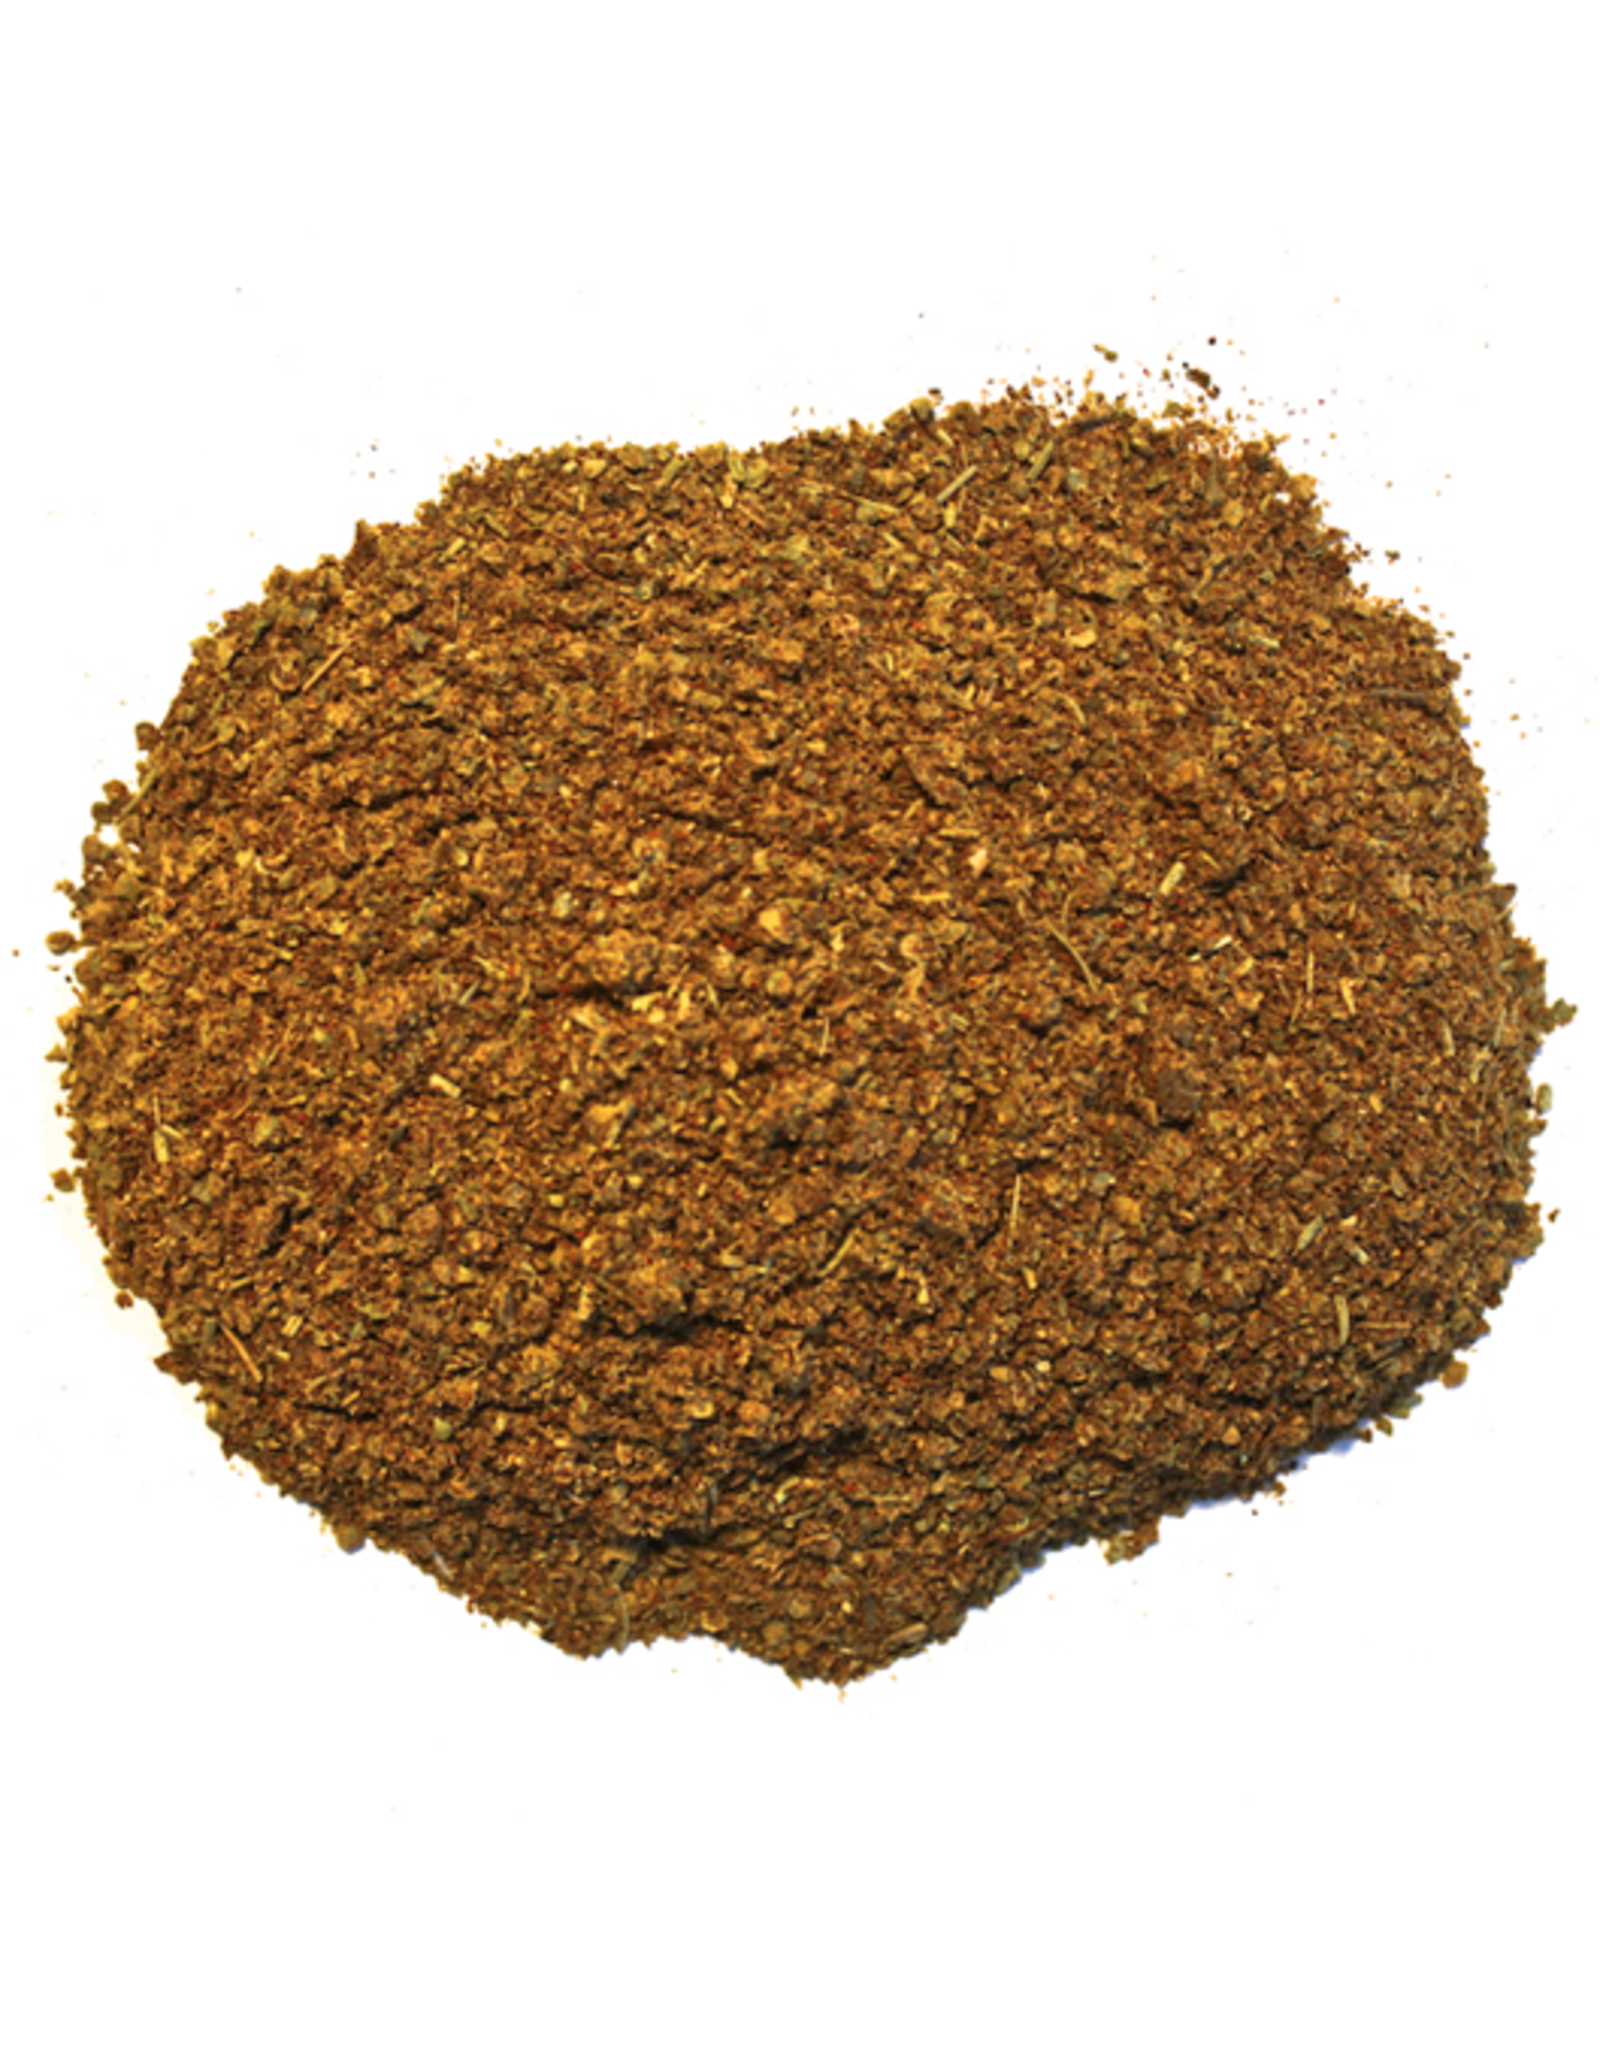 Gemengde kruiden en specerijen Hachee